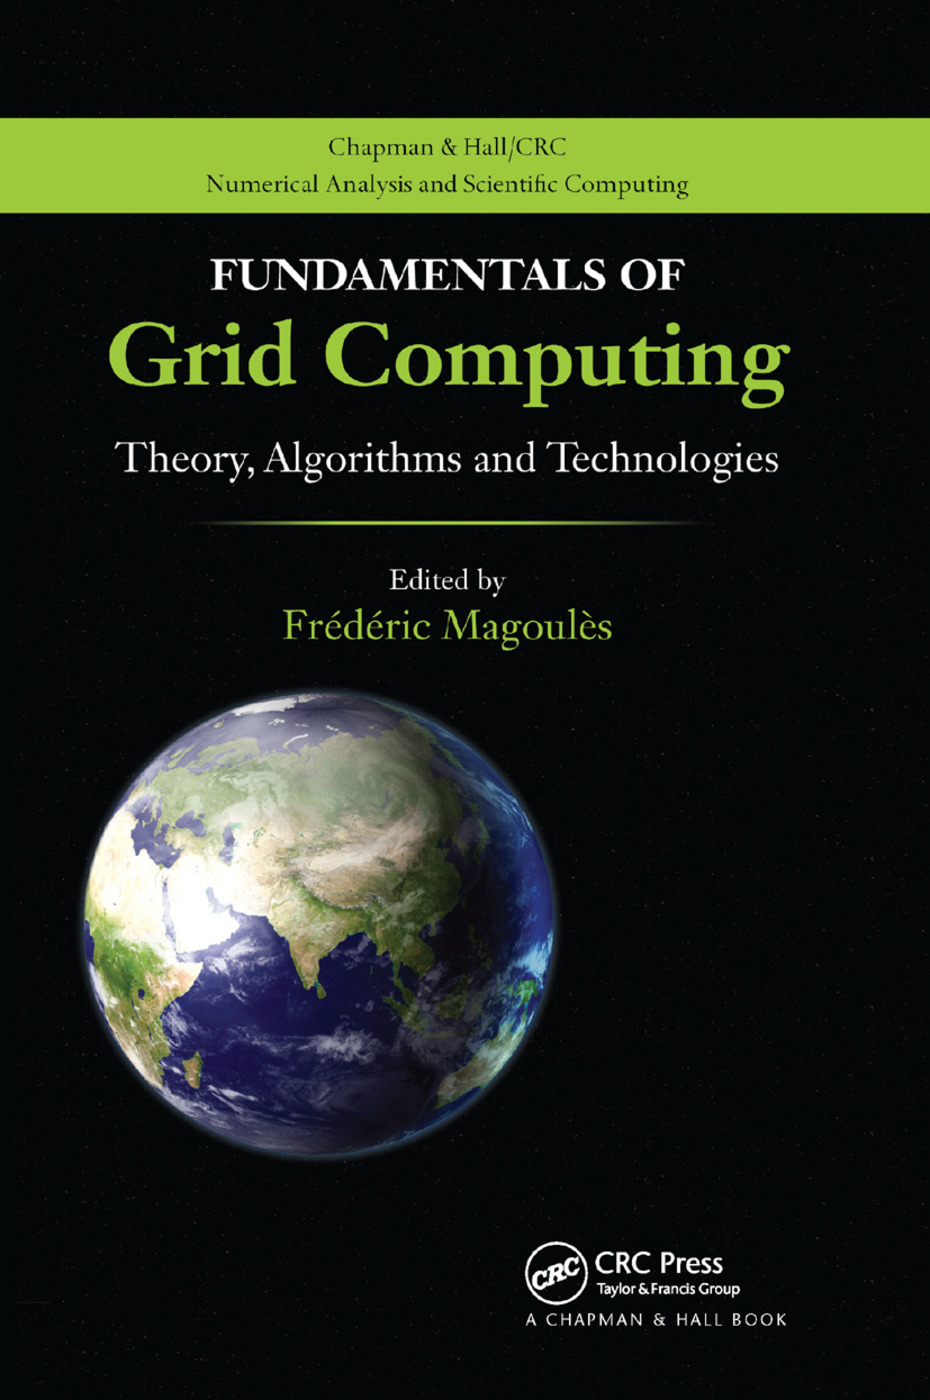 Fundamentals of Grid Computing